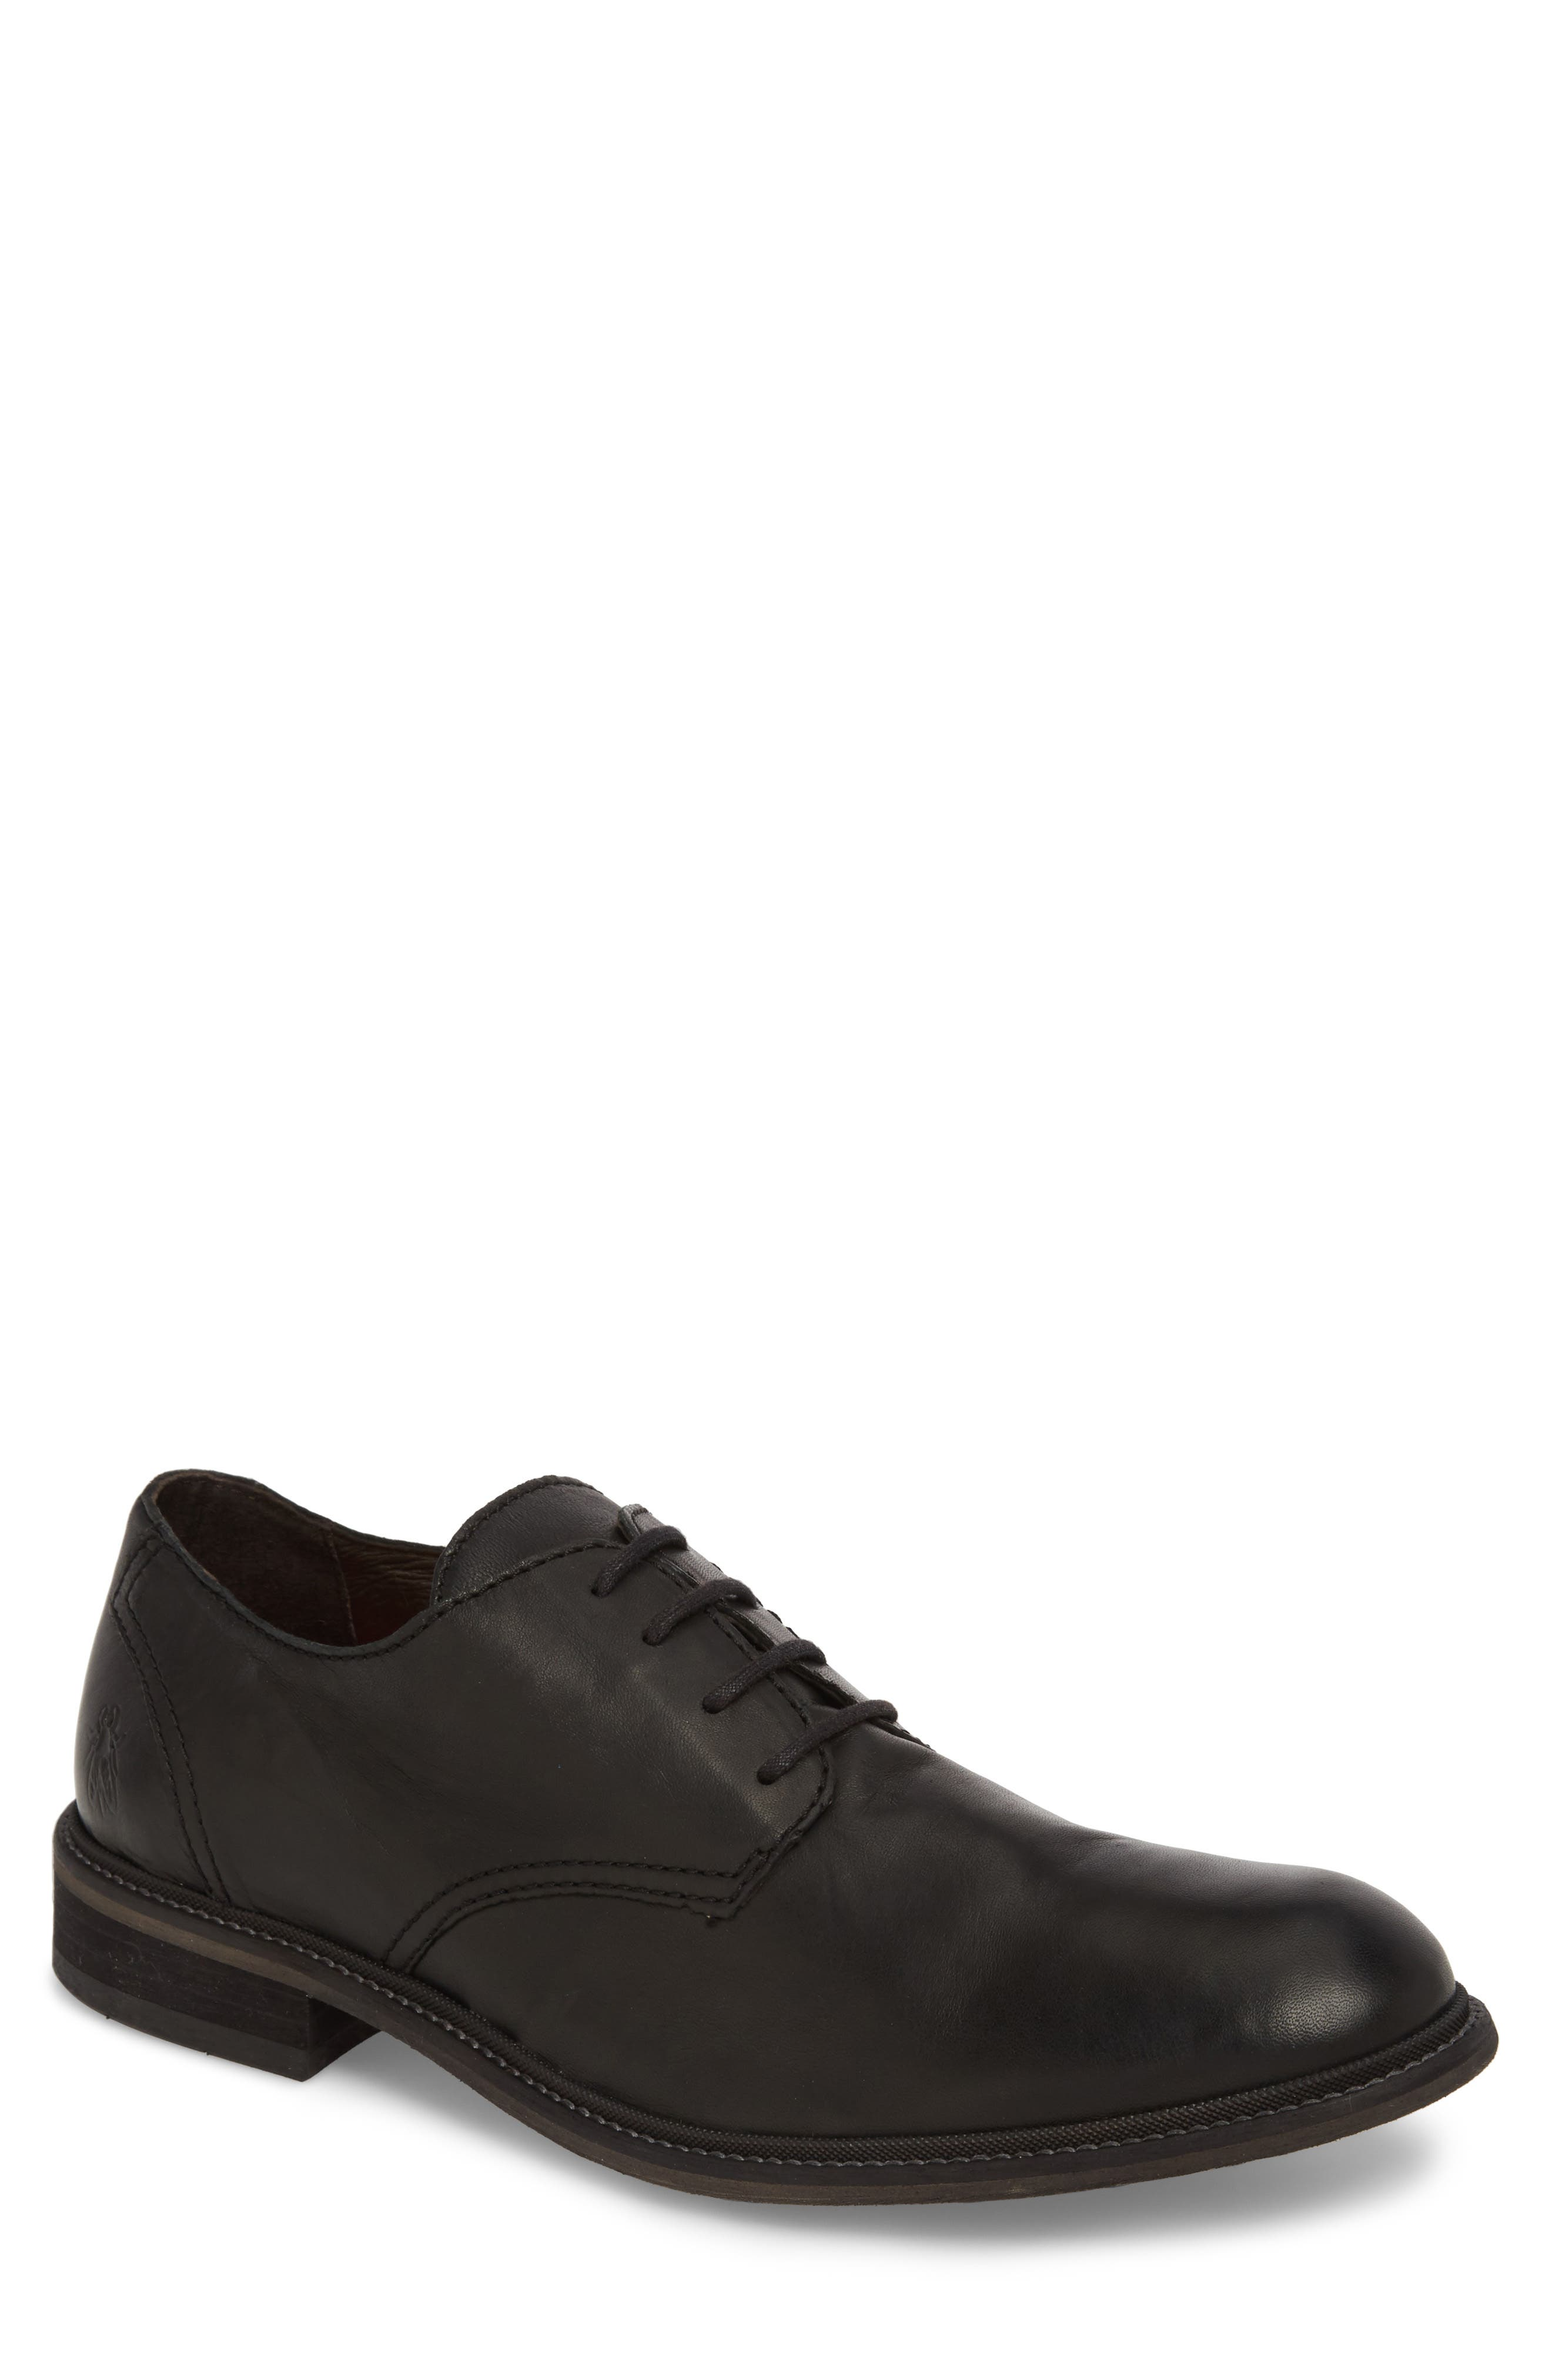 Hoco Plain Toe Derby,                         Main,                         color, Black Leather